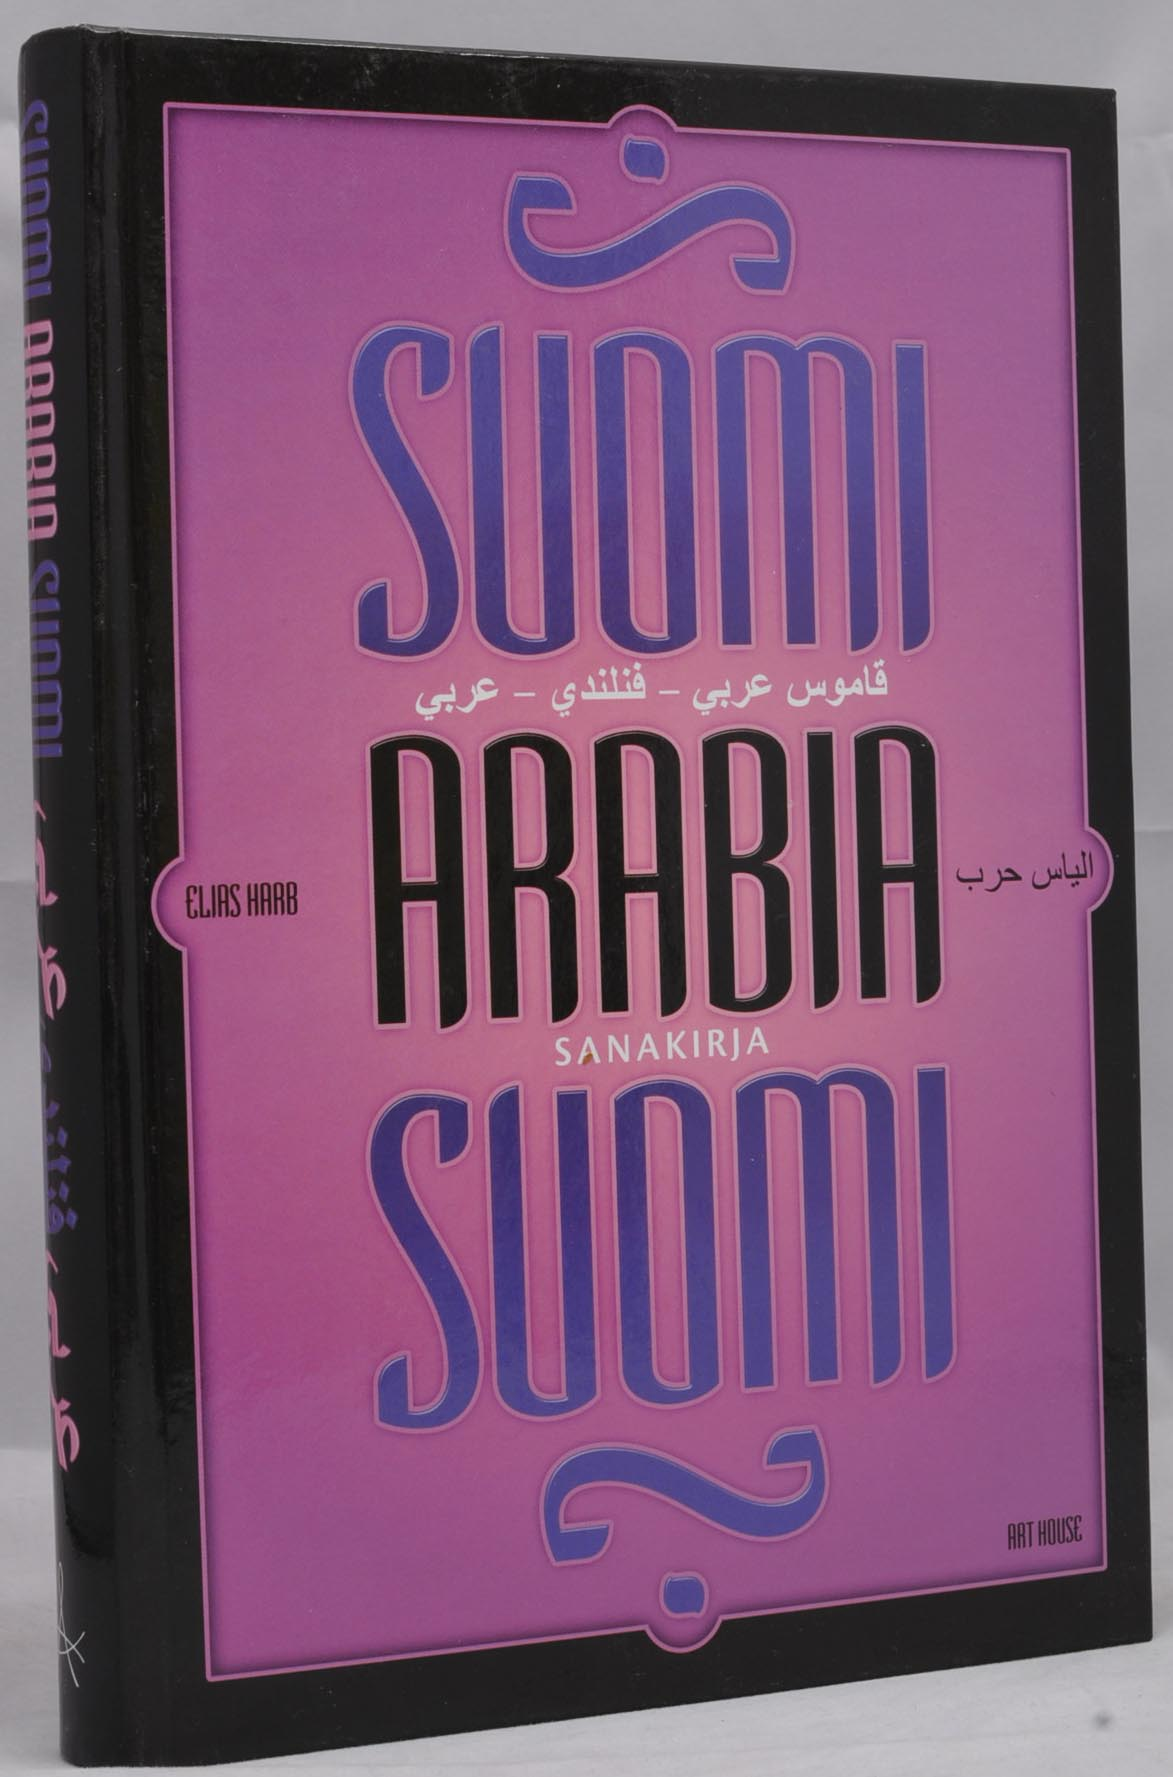 Suomi Arabia Sanakirja